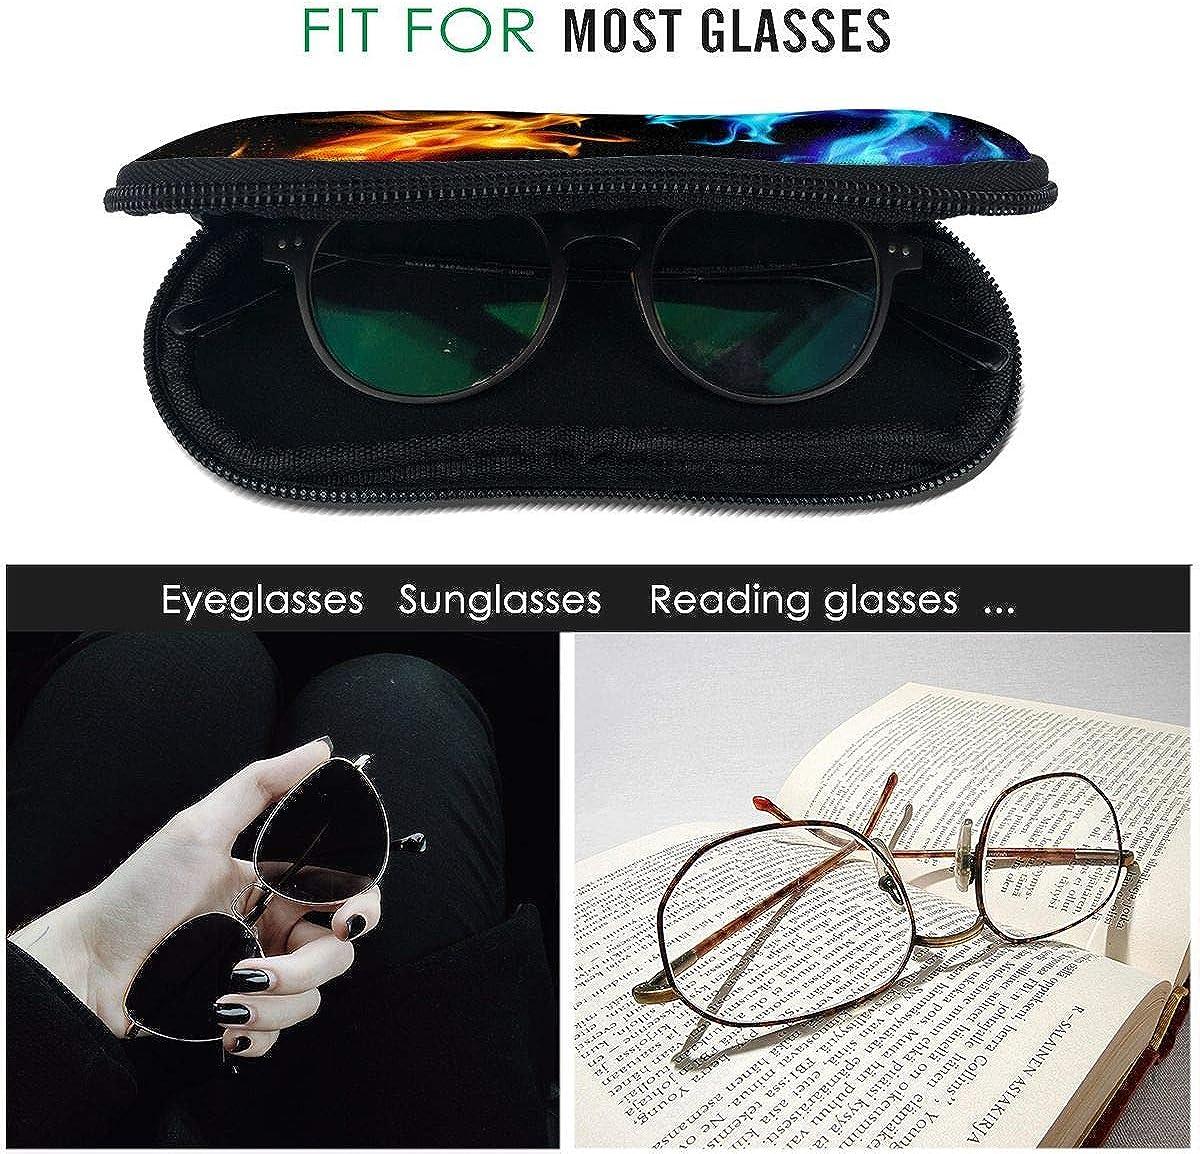 Blue Red Fiery Dragon Abstract Sunglasses Soft Case Ultra Light Neoprene Zipper Eyeglass Case With Key Chain